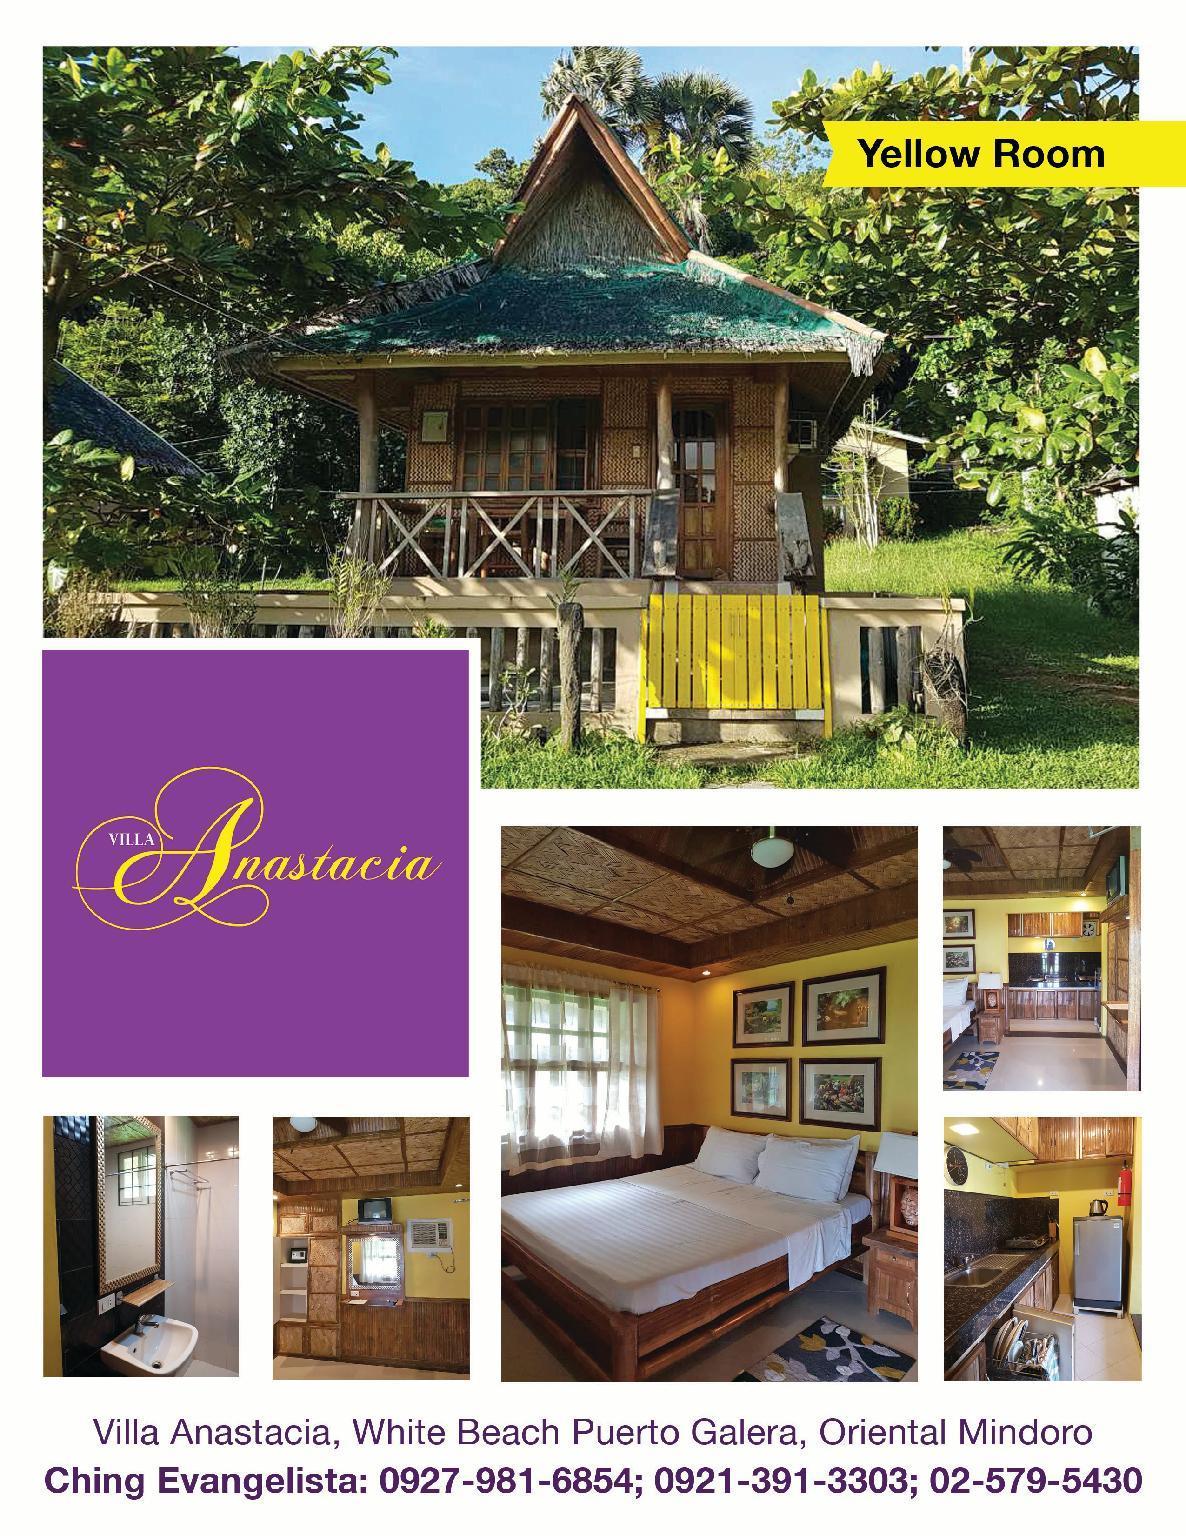 Villa Anastacia Yellow Room